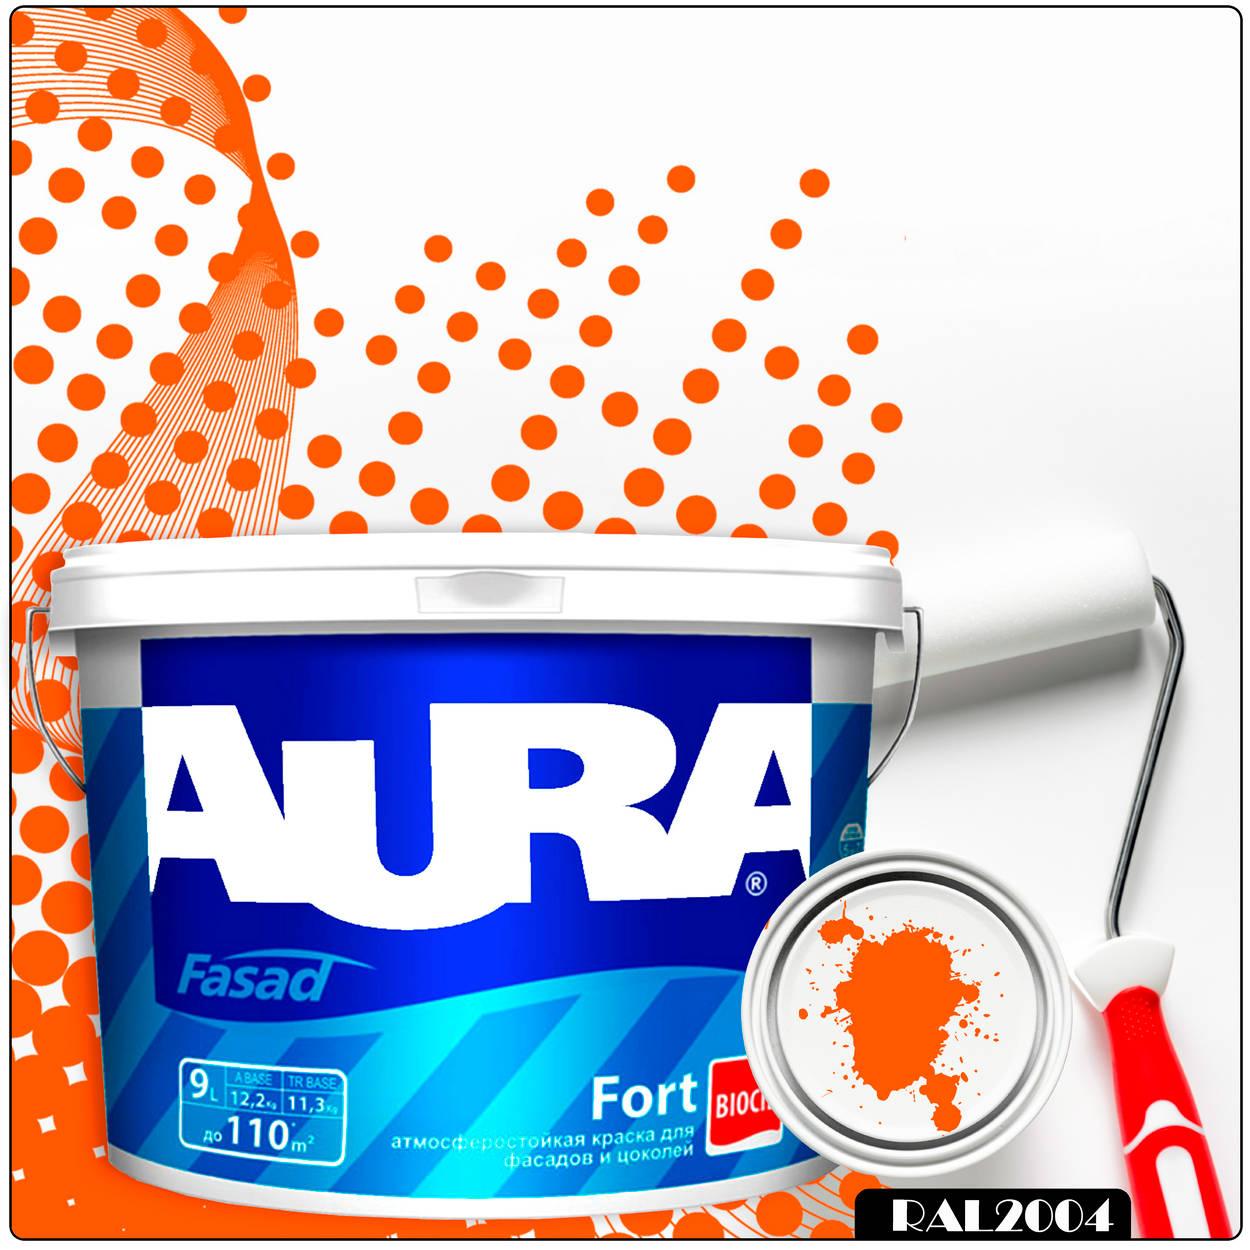 Фото 5 - Краска Aura Fasad Fort, RAL 2004 Оранжевый, латексная, матовая, для фасада и цоколей, 9л, Аура.